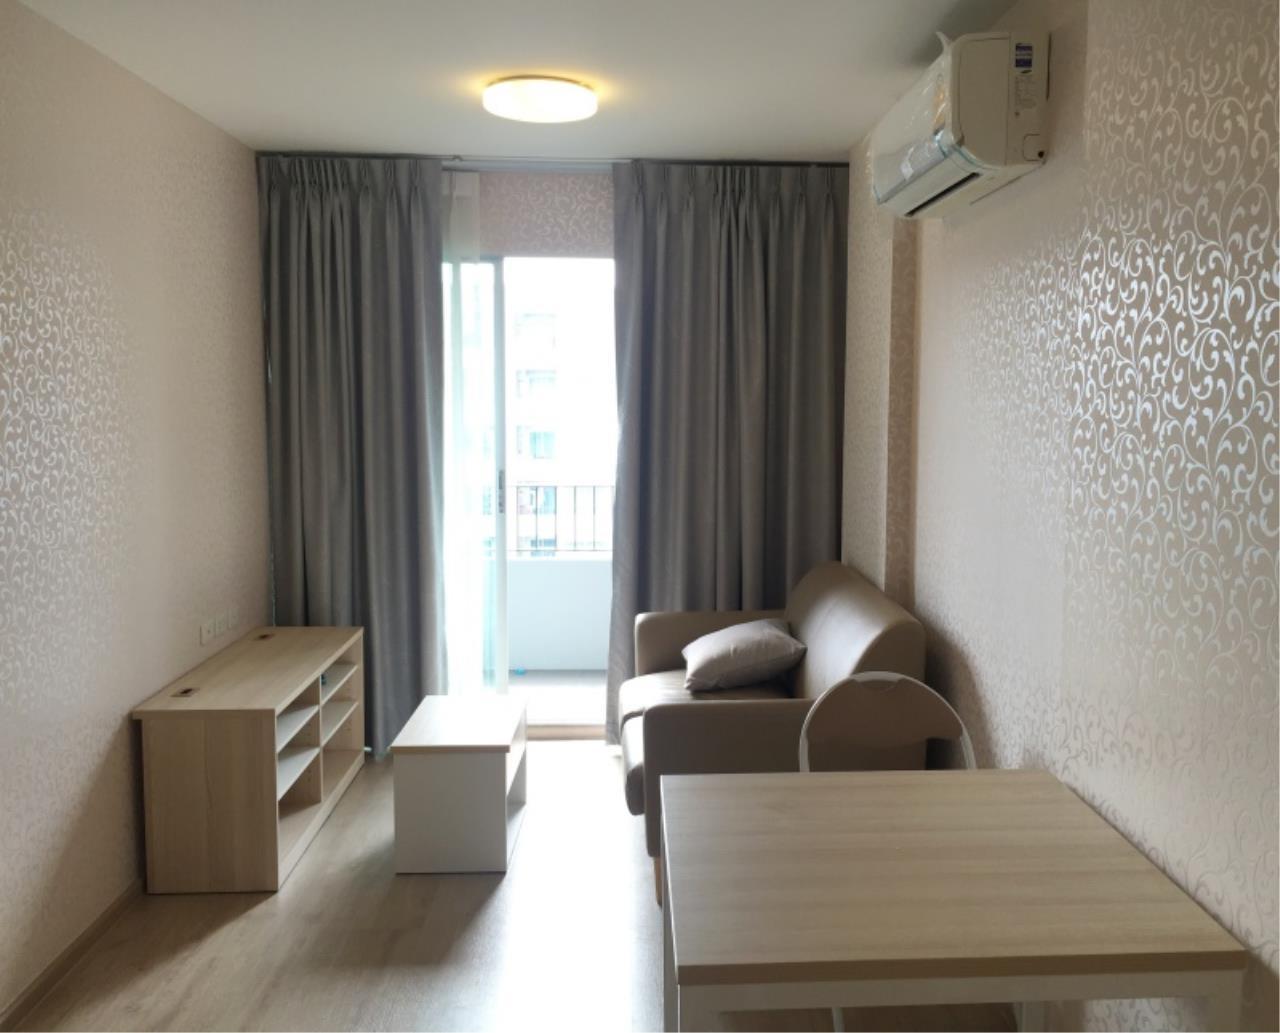 Century21 Skylux Agency's Elio Del Ray / Condo For Sale / 1 Bedroom / 34.5 SQM / BTS Punnawithi / Bangkok 1